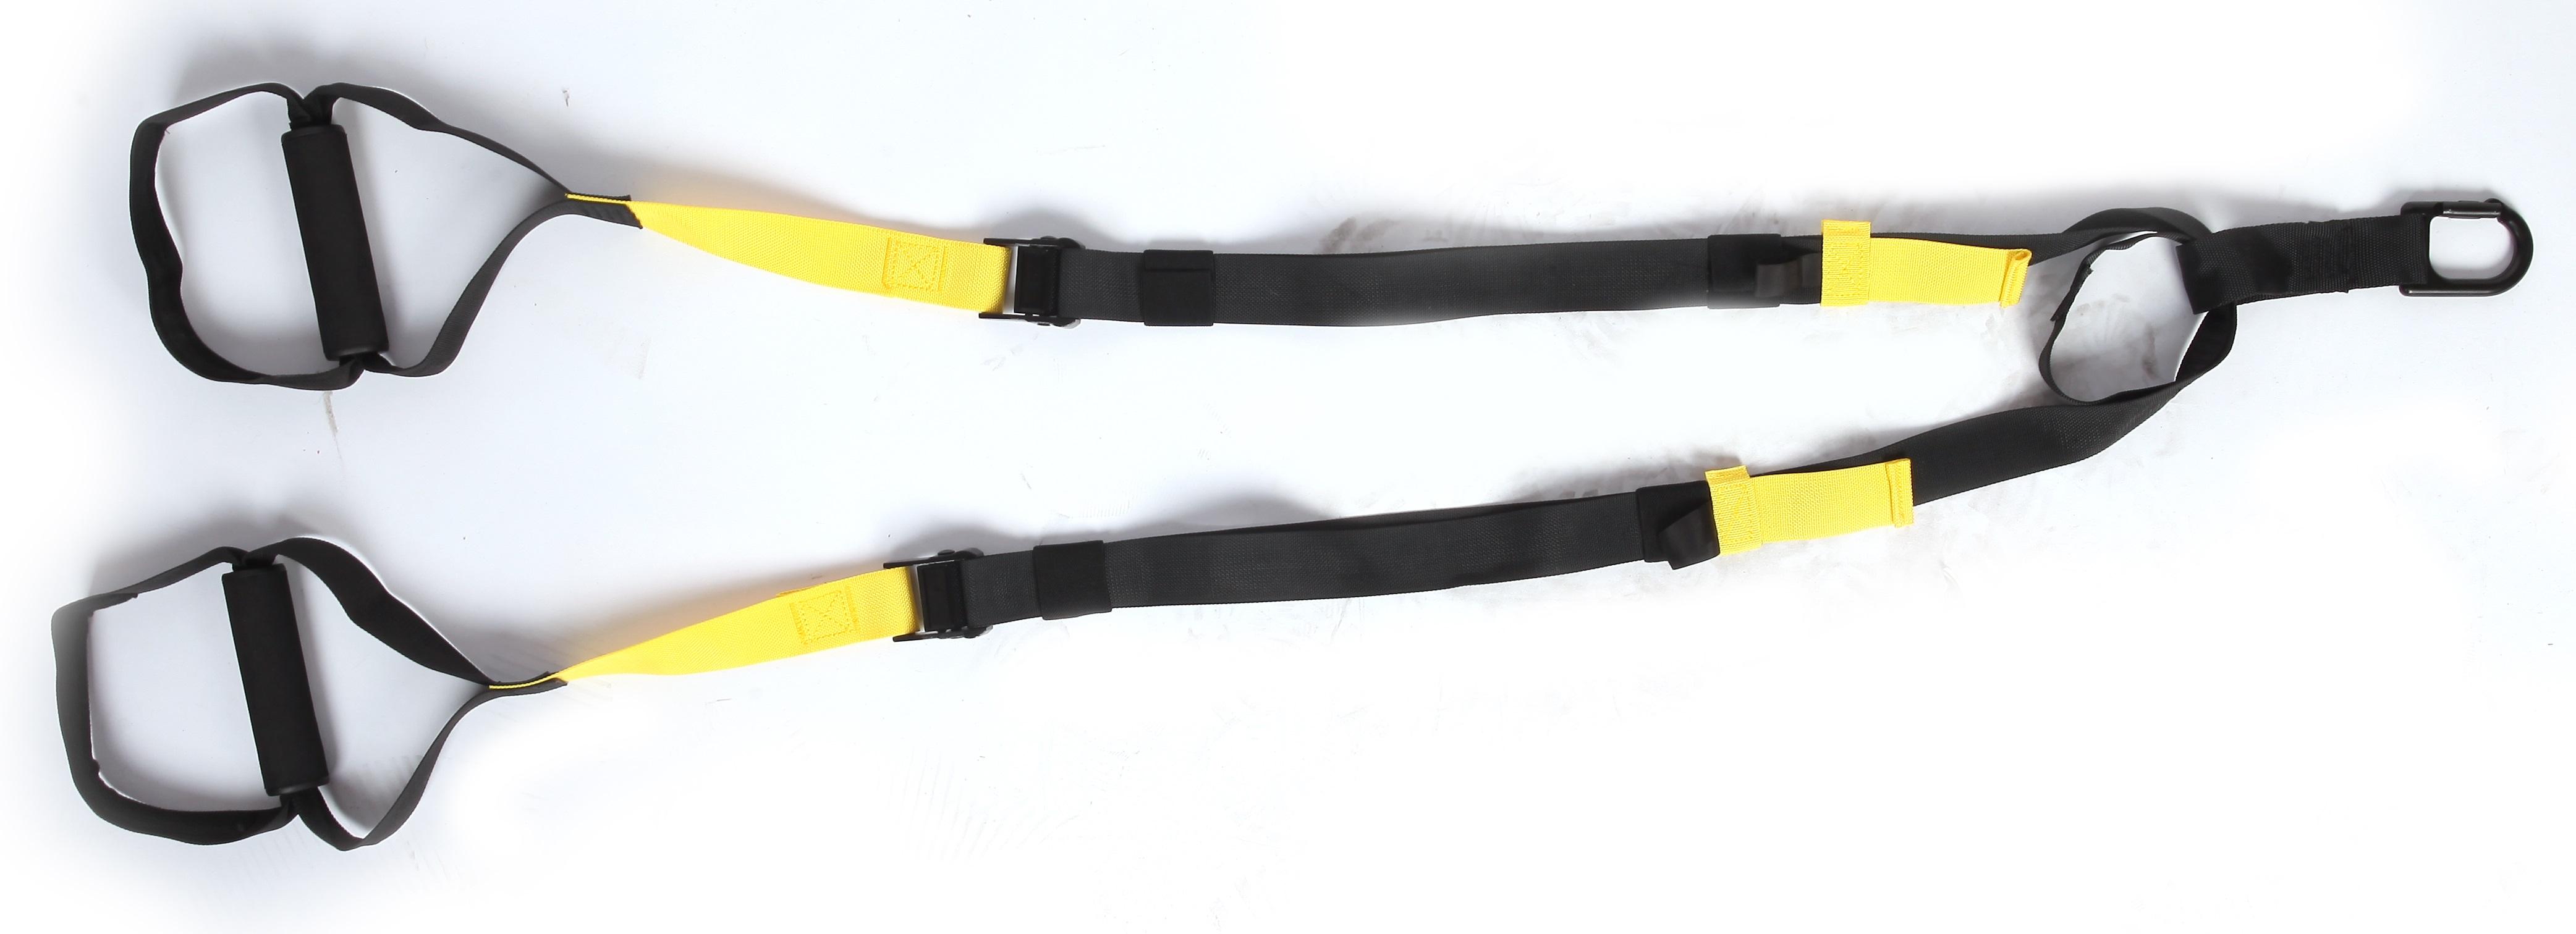 Suspension Trainer Straps Workout  Z2511